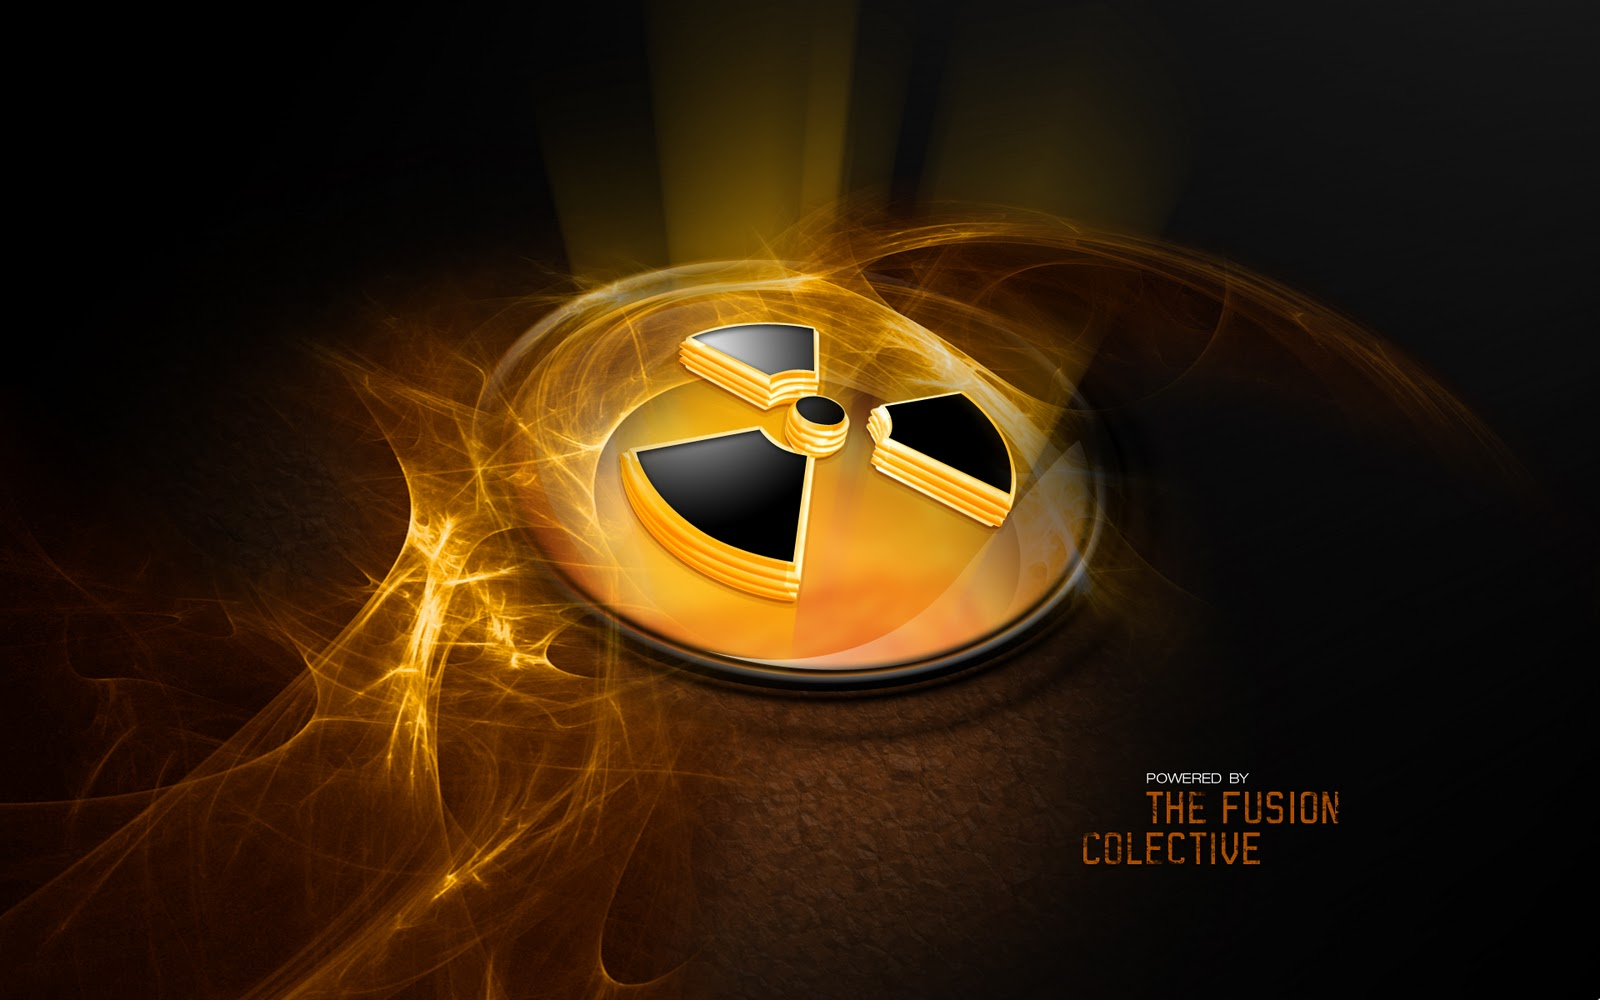 Cool Nuclear Radiation Symbol | www.imgkid.com - The Image ...